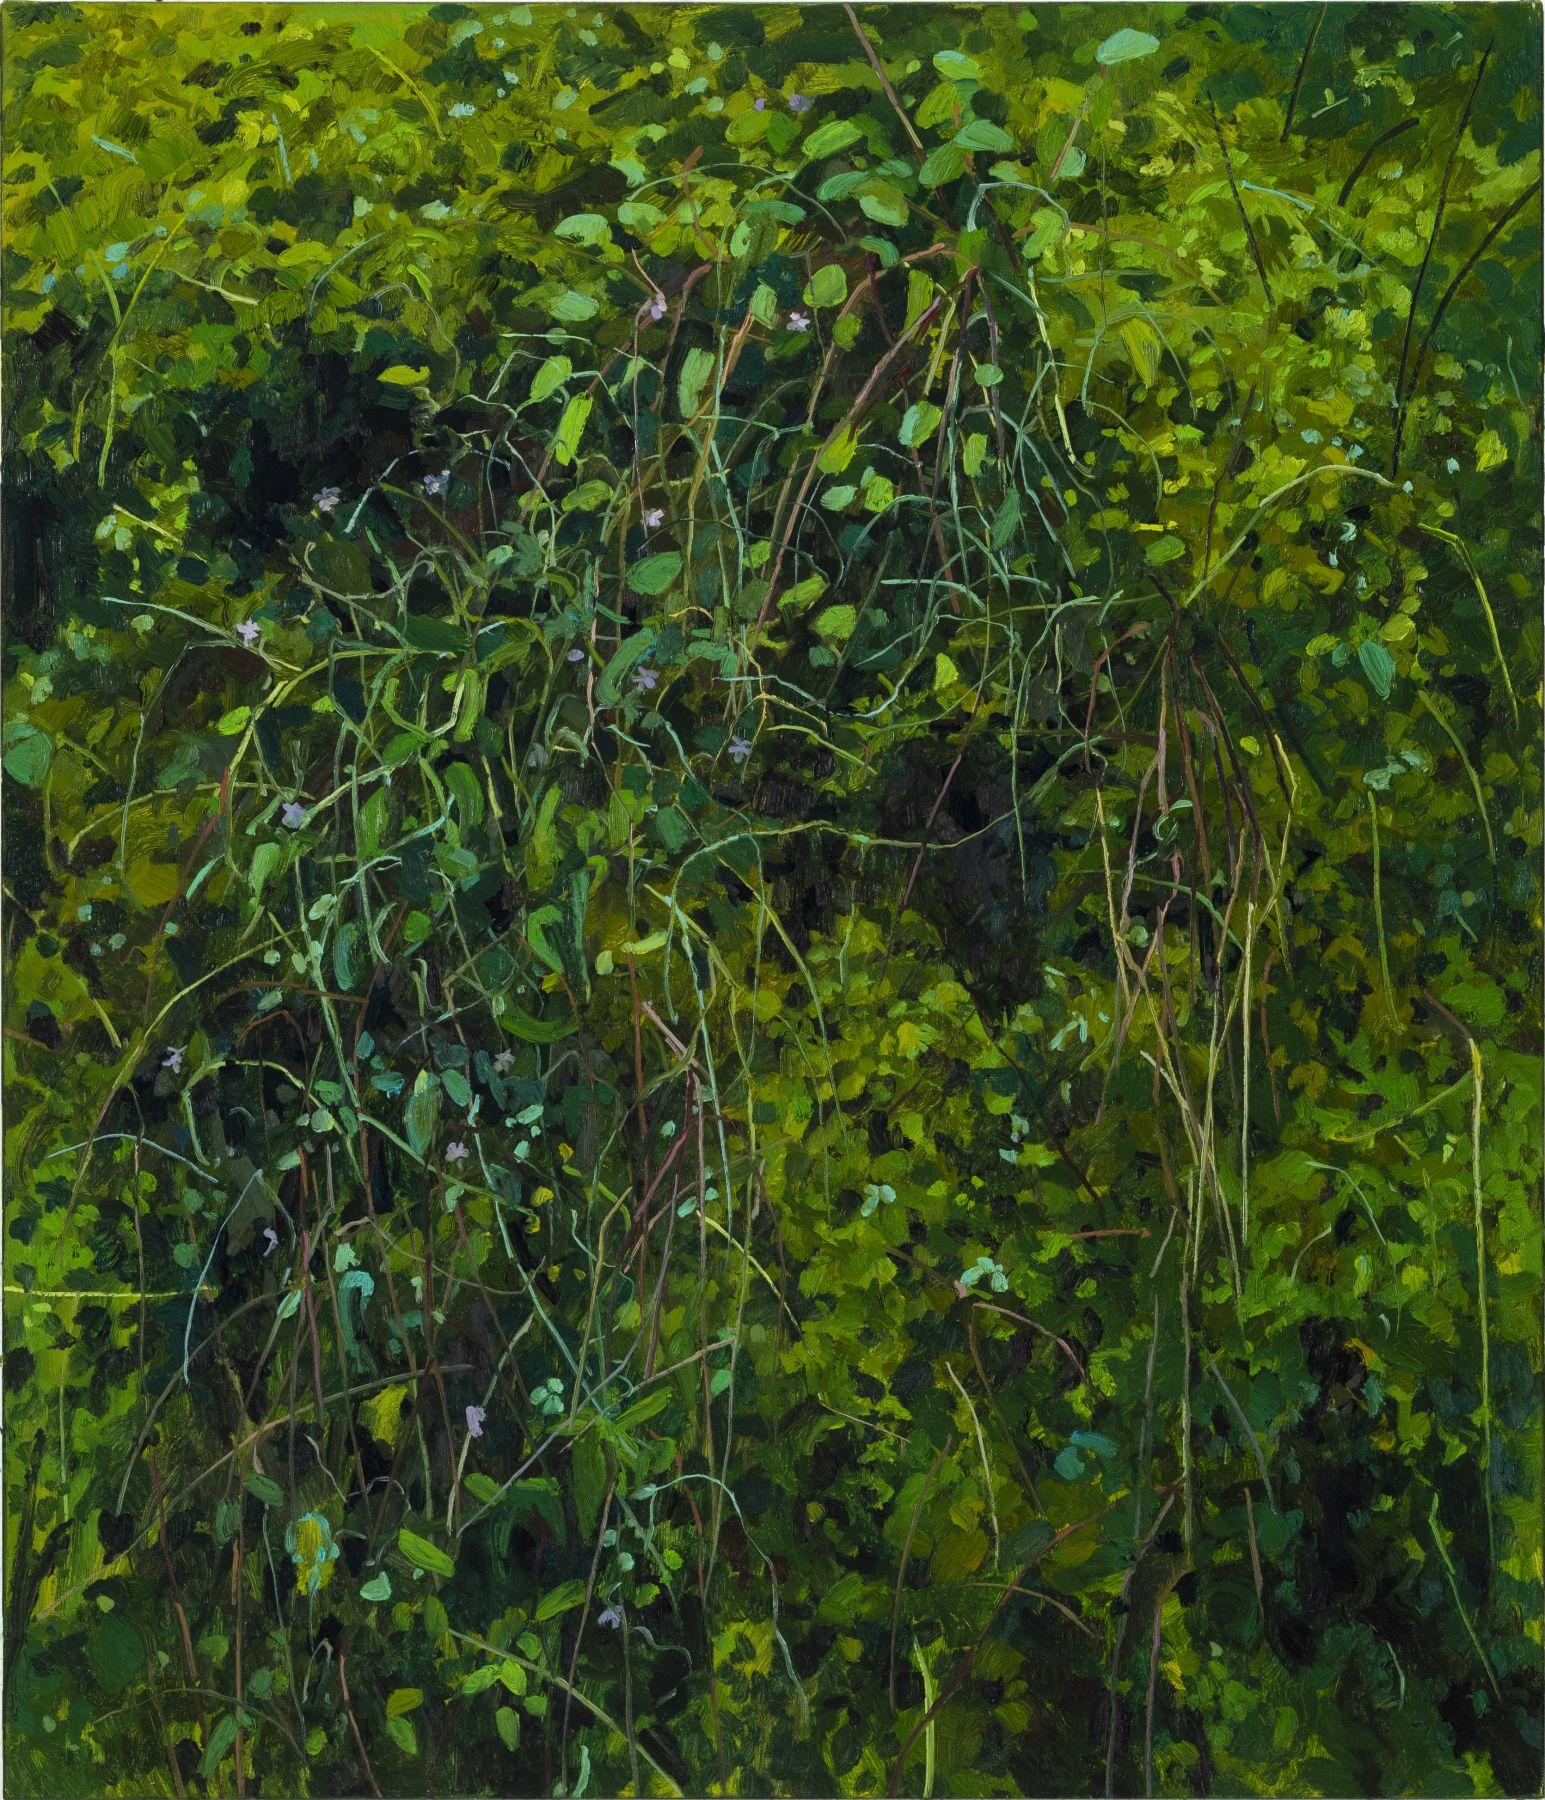 Moss and Grass, 2017